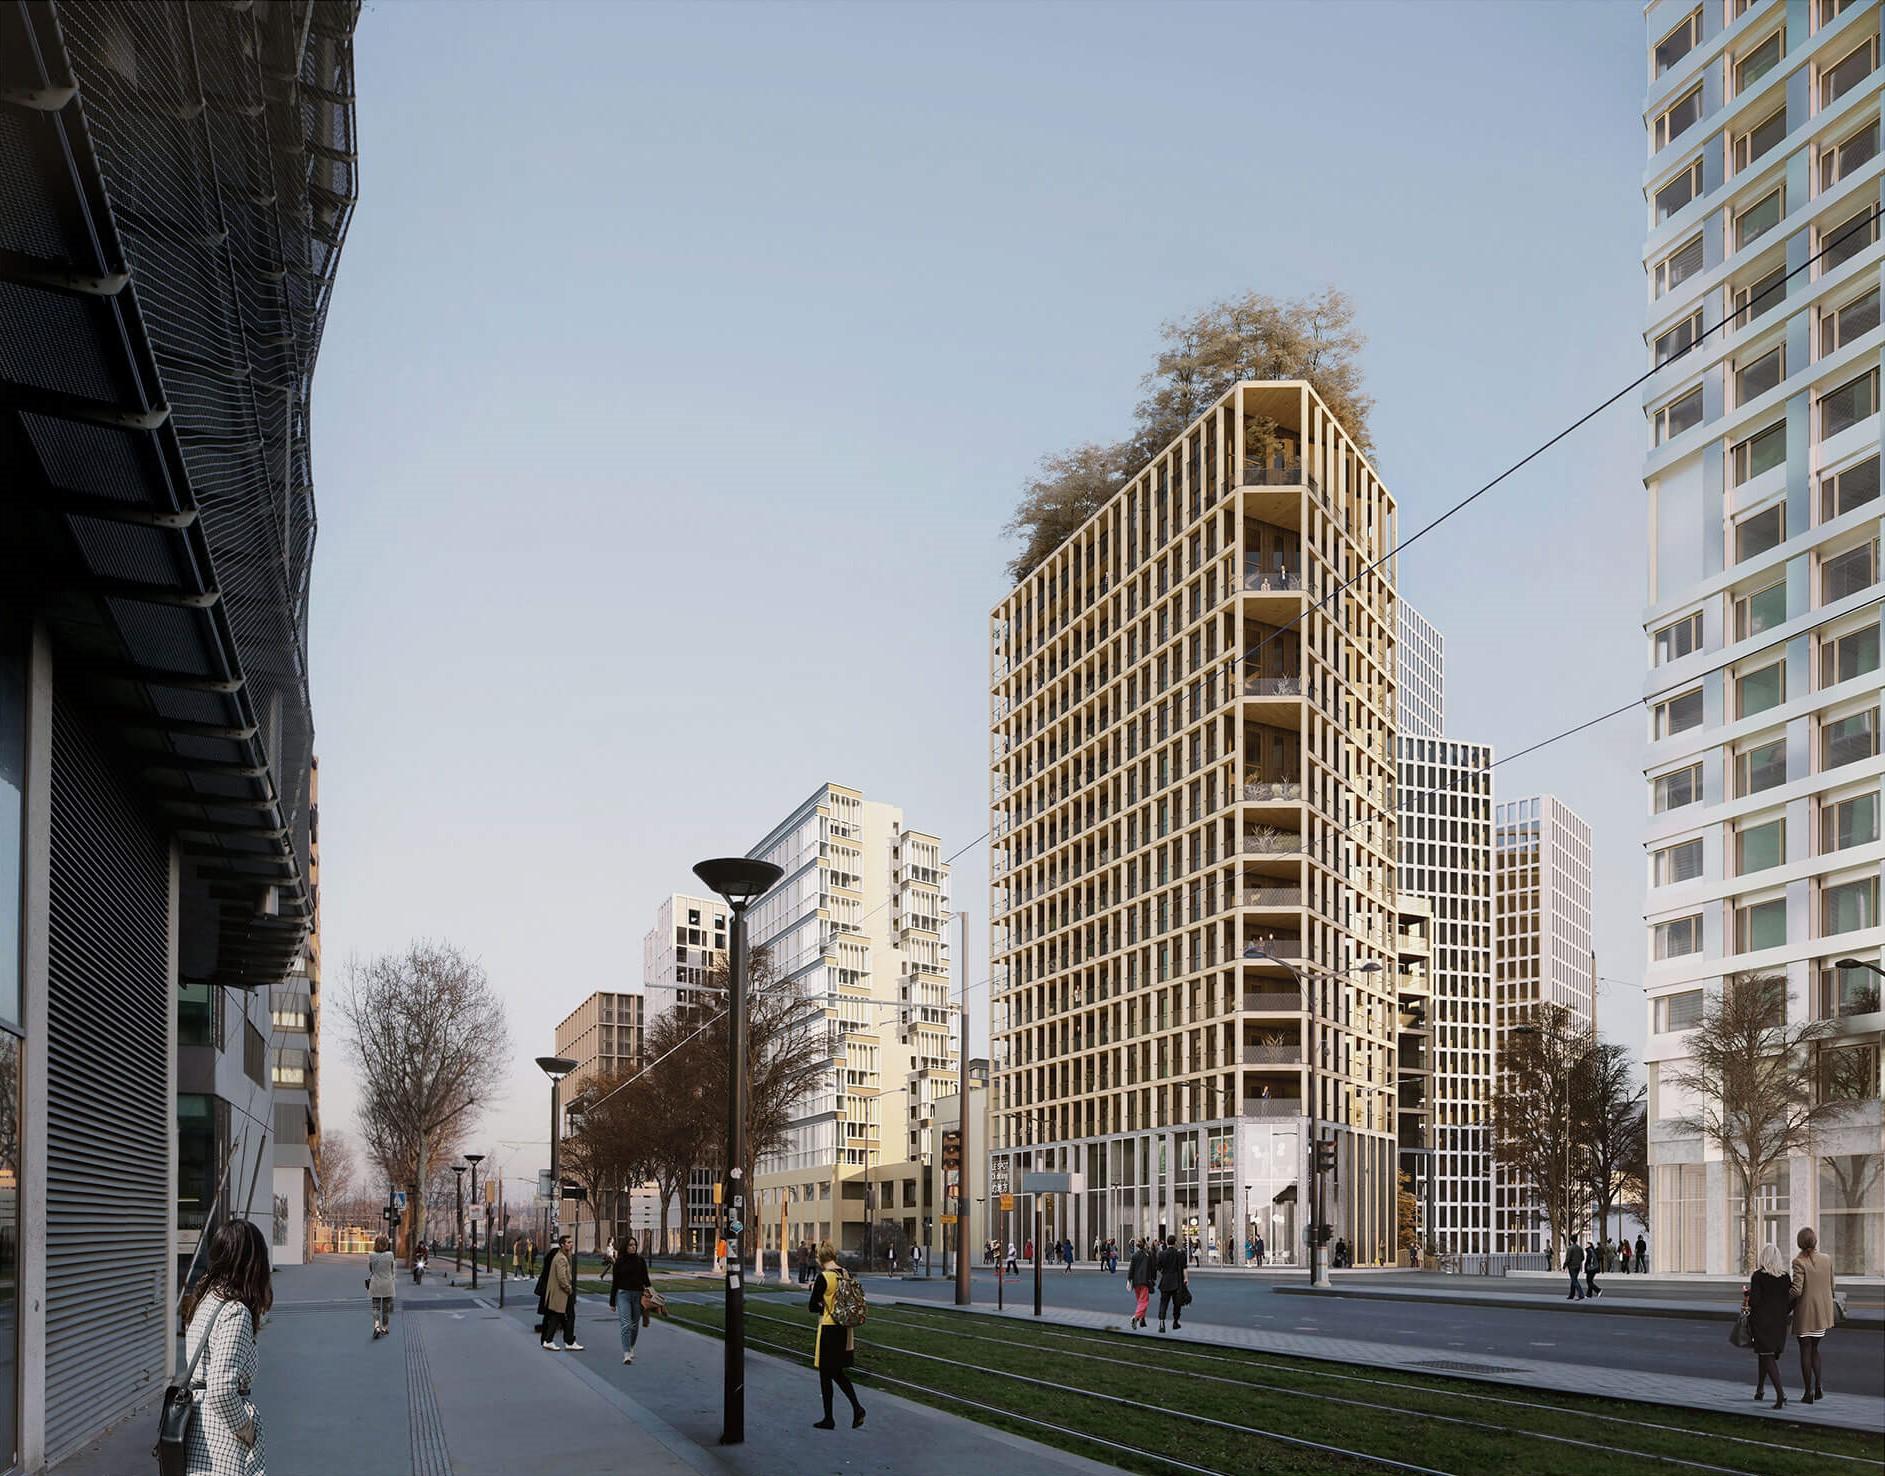 https://i.ibb.co/zNHb72B/3-2-Architecture-Le-Spot-B1-B2-phase-2-Vue-depuis-le-Boulevard-du-G-n-ral-Jean-Simon.jpg